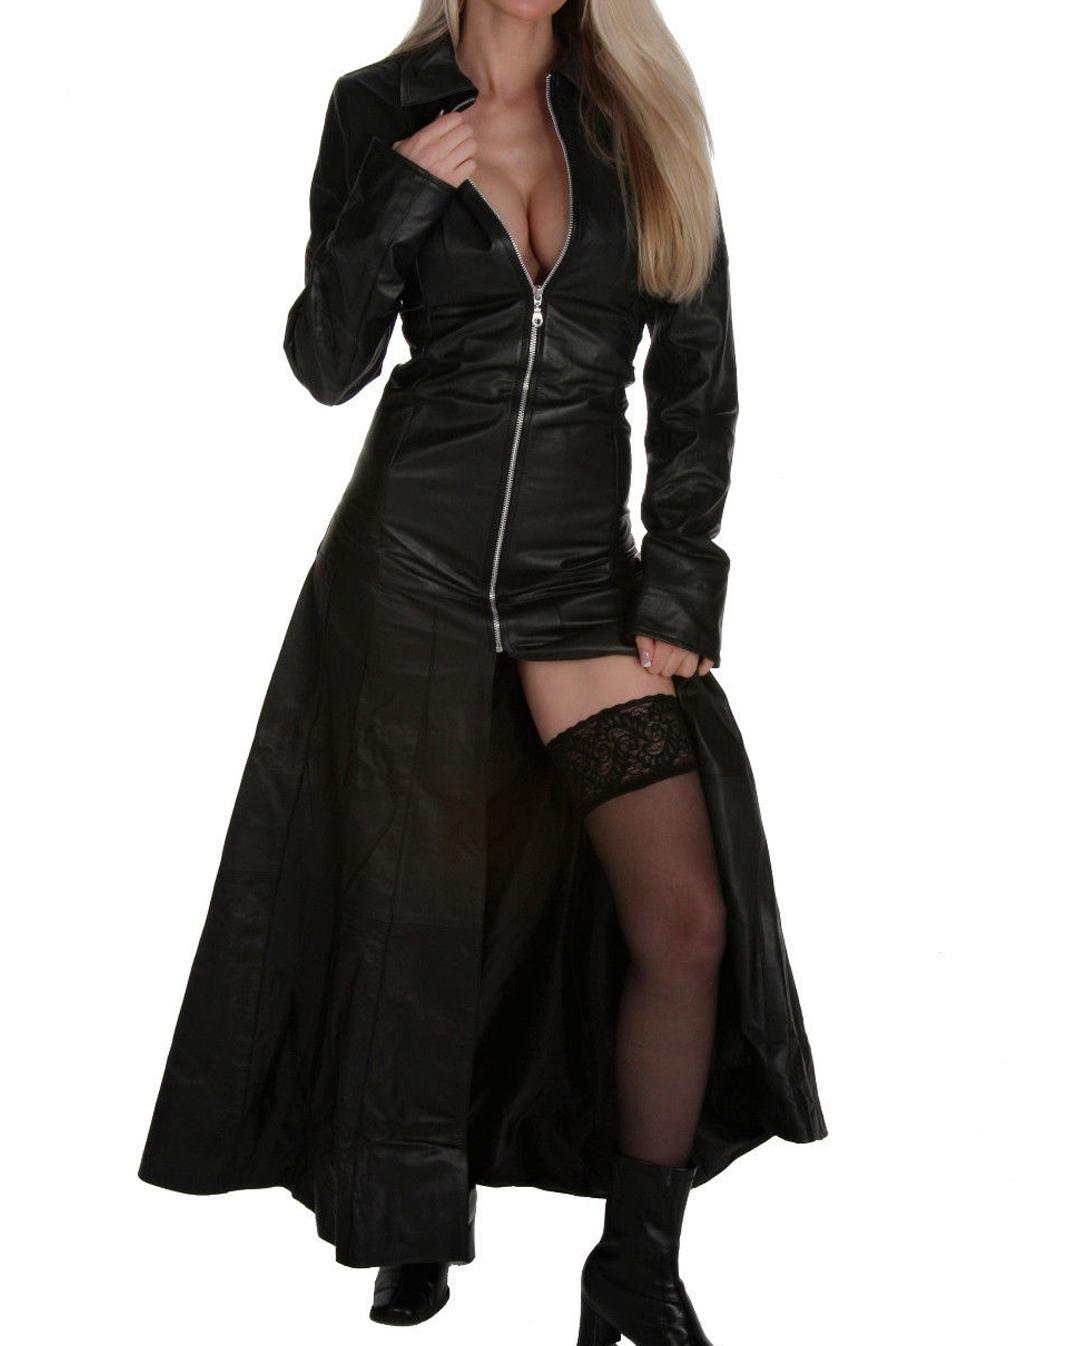 rebelsmarket_women_log_gothic_coat_genuine_leather_fashion_front_zipper_coat_dress_coats_5.jpg